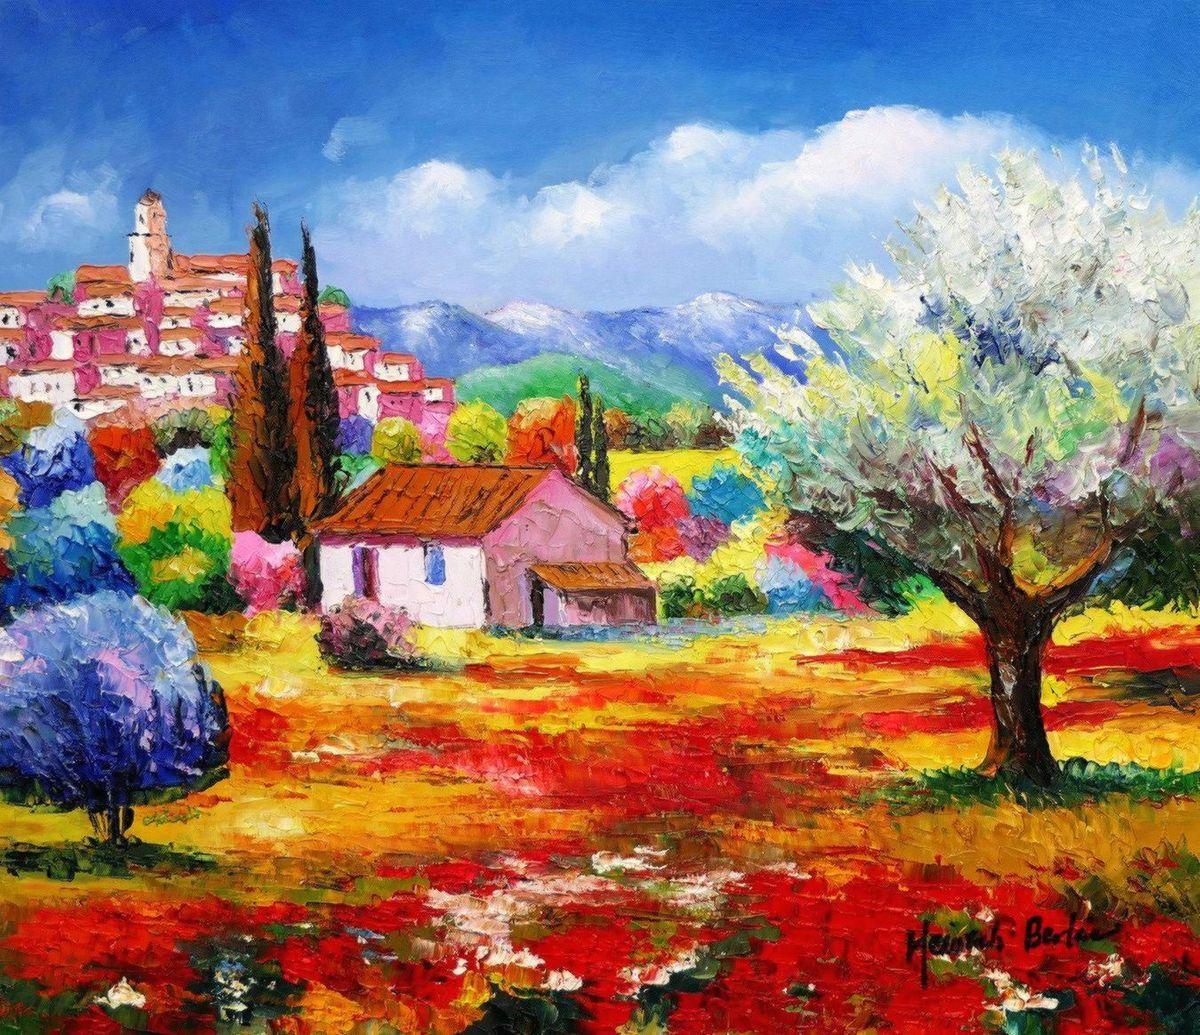 Modern Art - Frühling in der Toskana c97024 50x60cm exquisites Ölbild